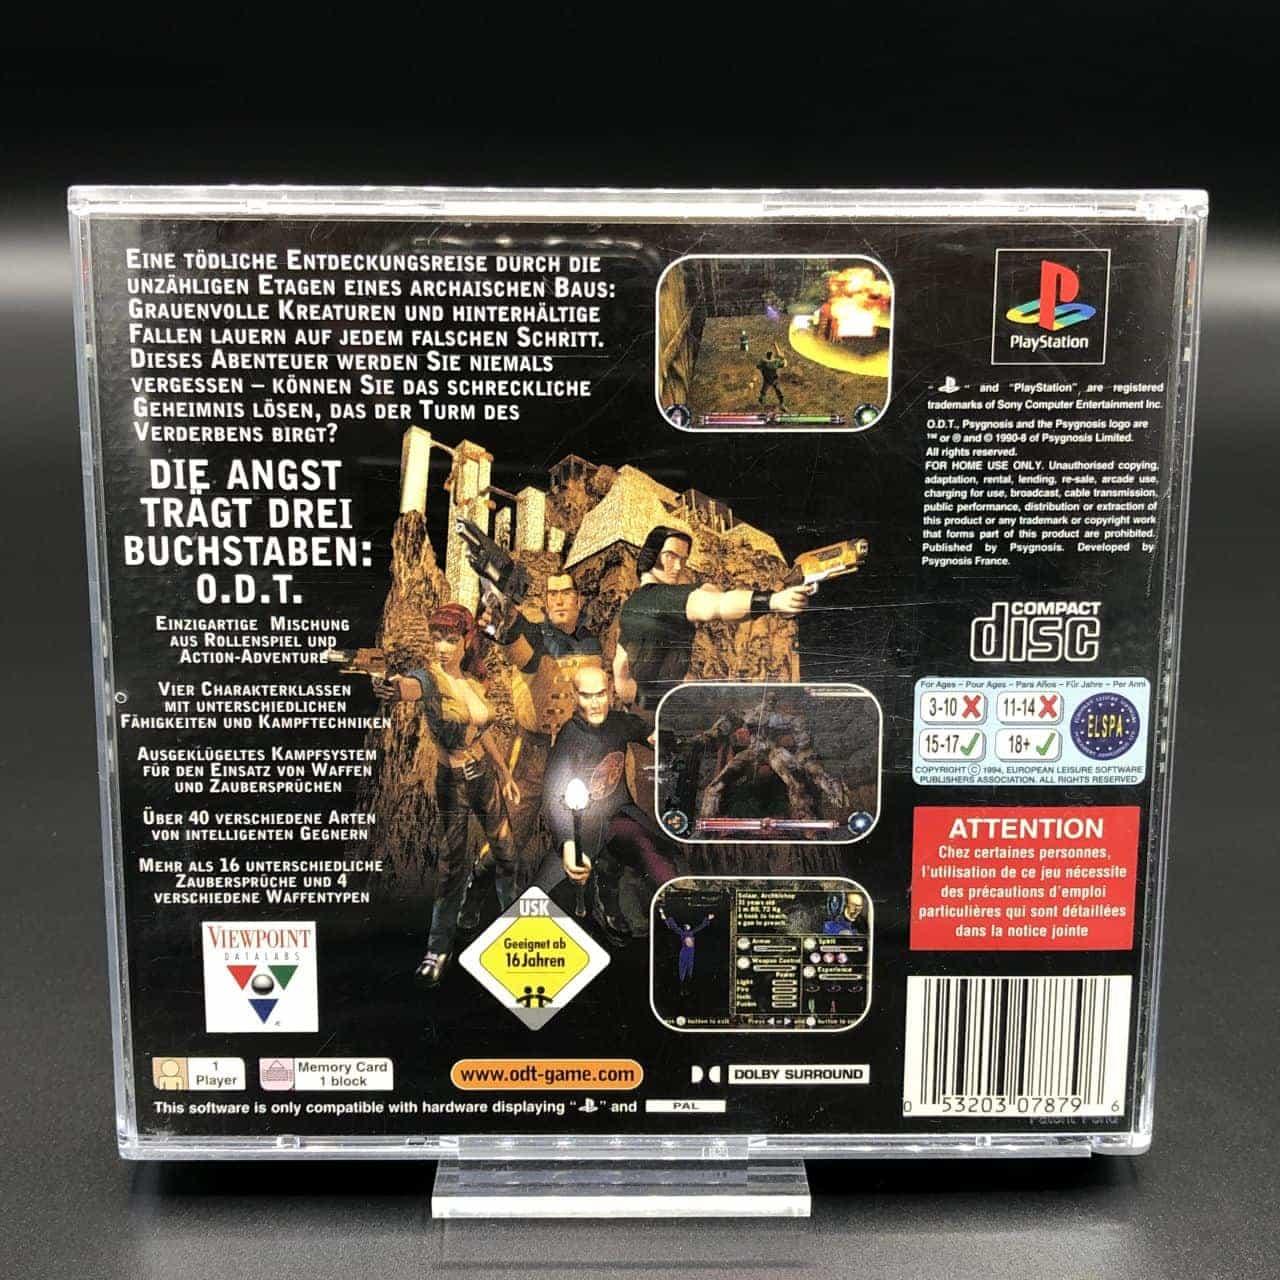 PS1 ODT (Komplett) (Sehr gut) Sony PlayStation 1